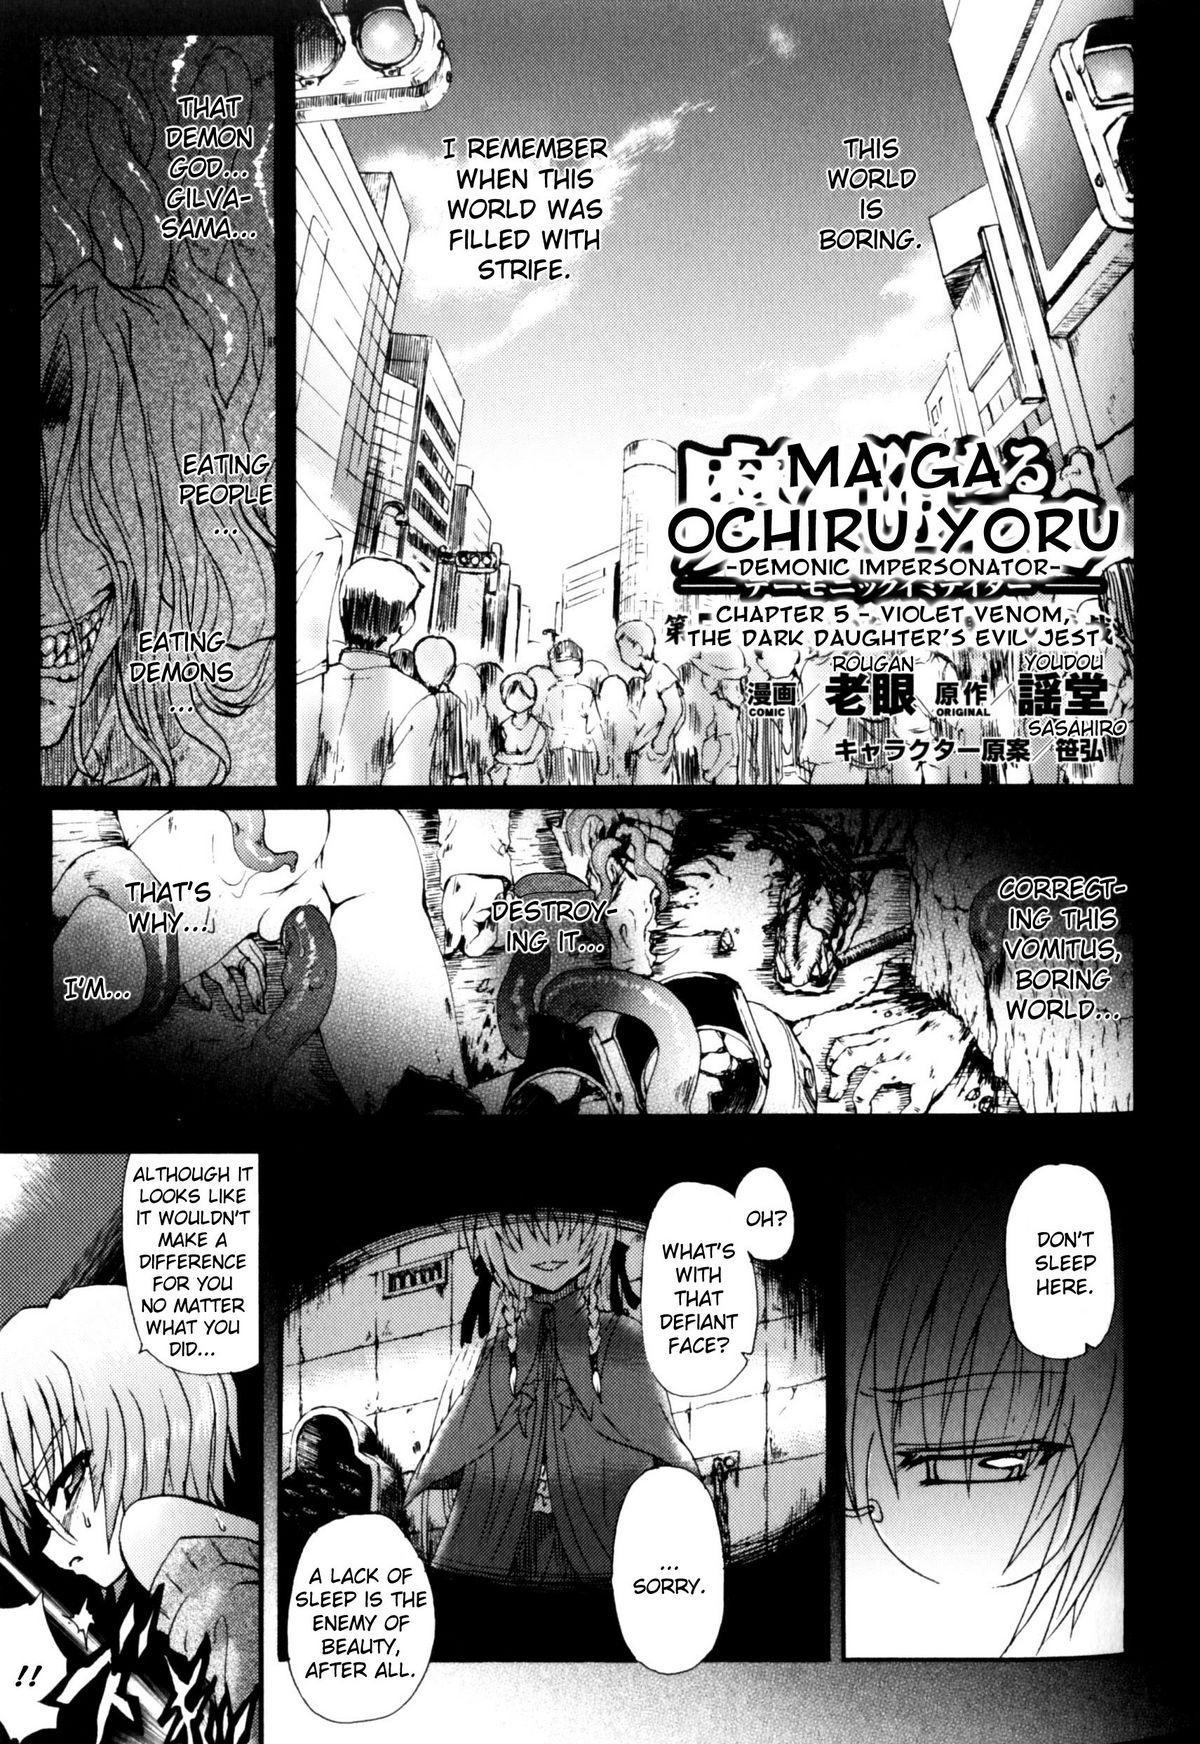 [Rougan] Ma ga Ochiru Yoru (The Night When Evil Falls) - Demonic Imitator Ch. 01-05 [ENG] 92